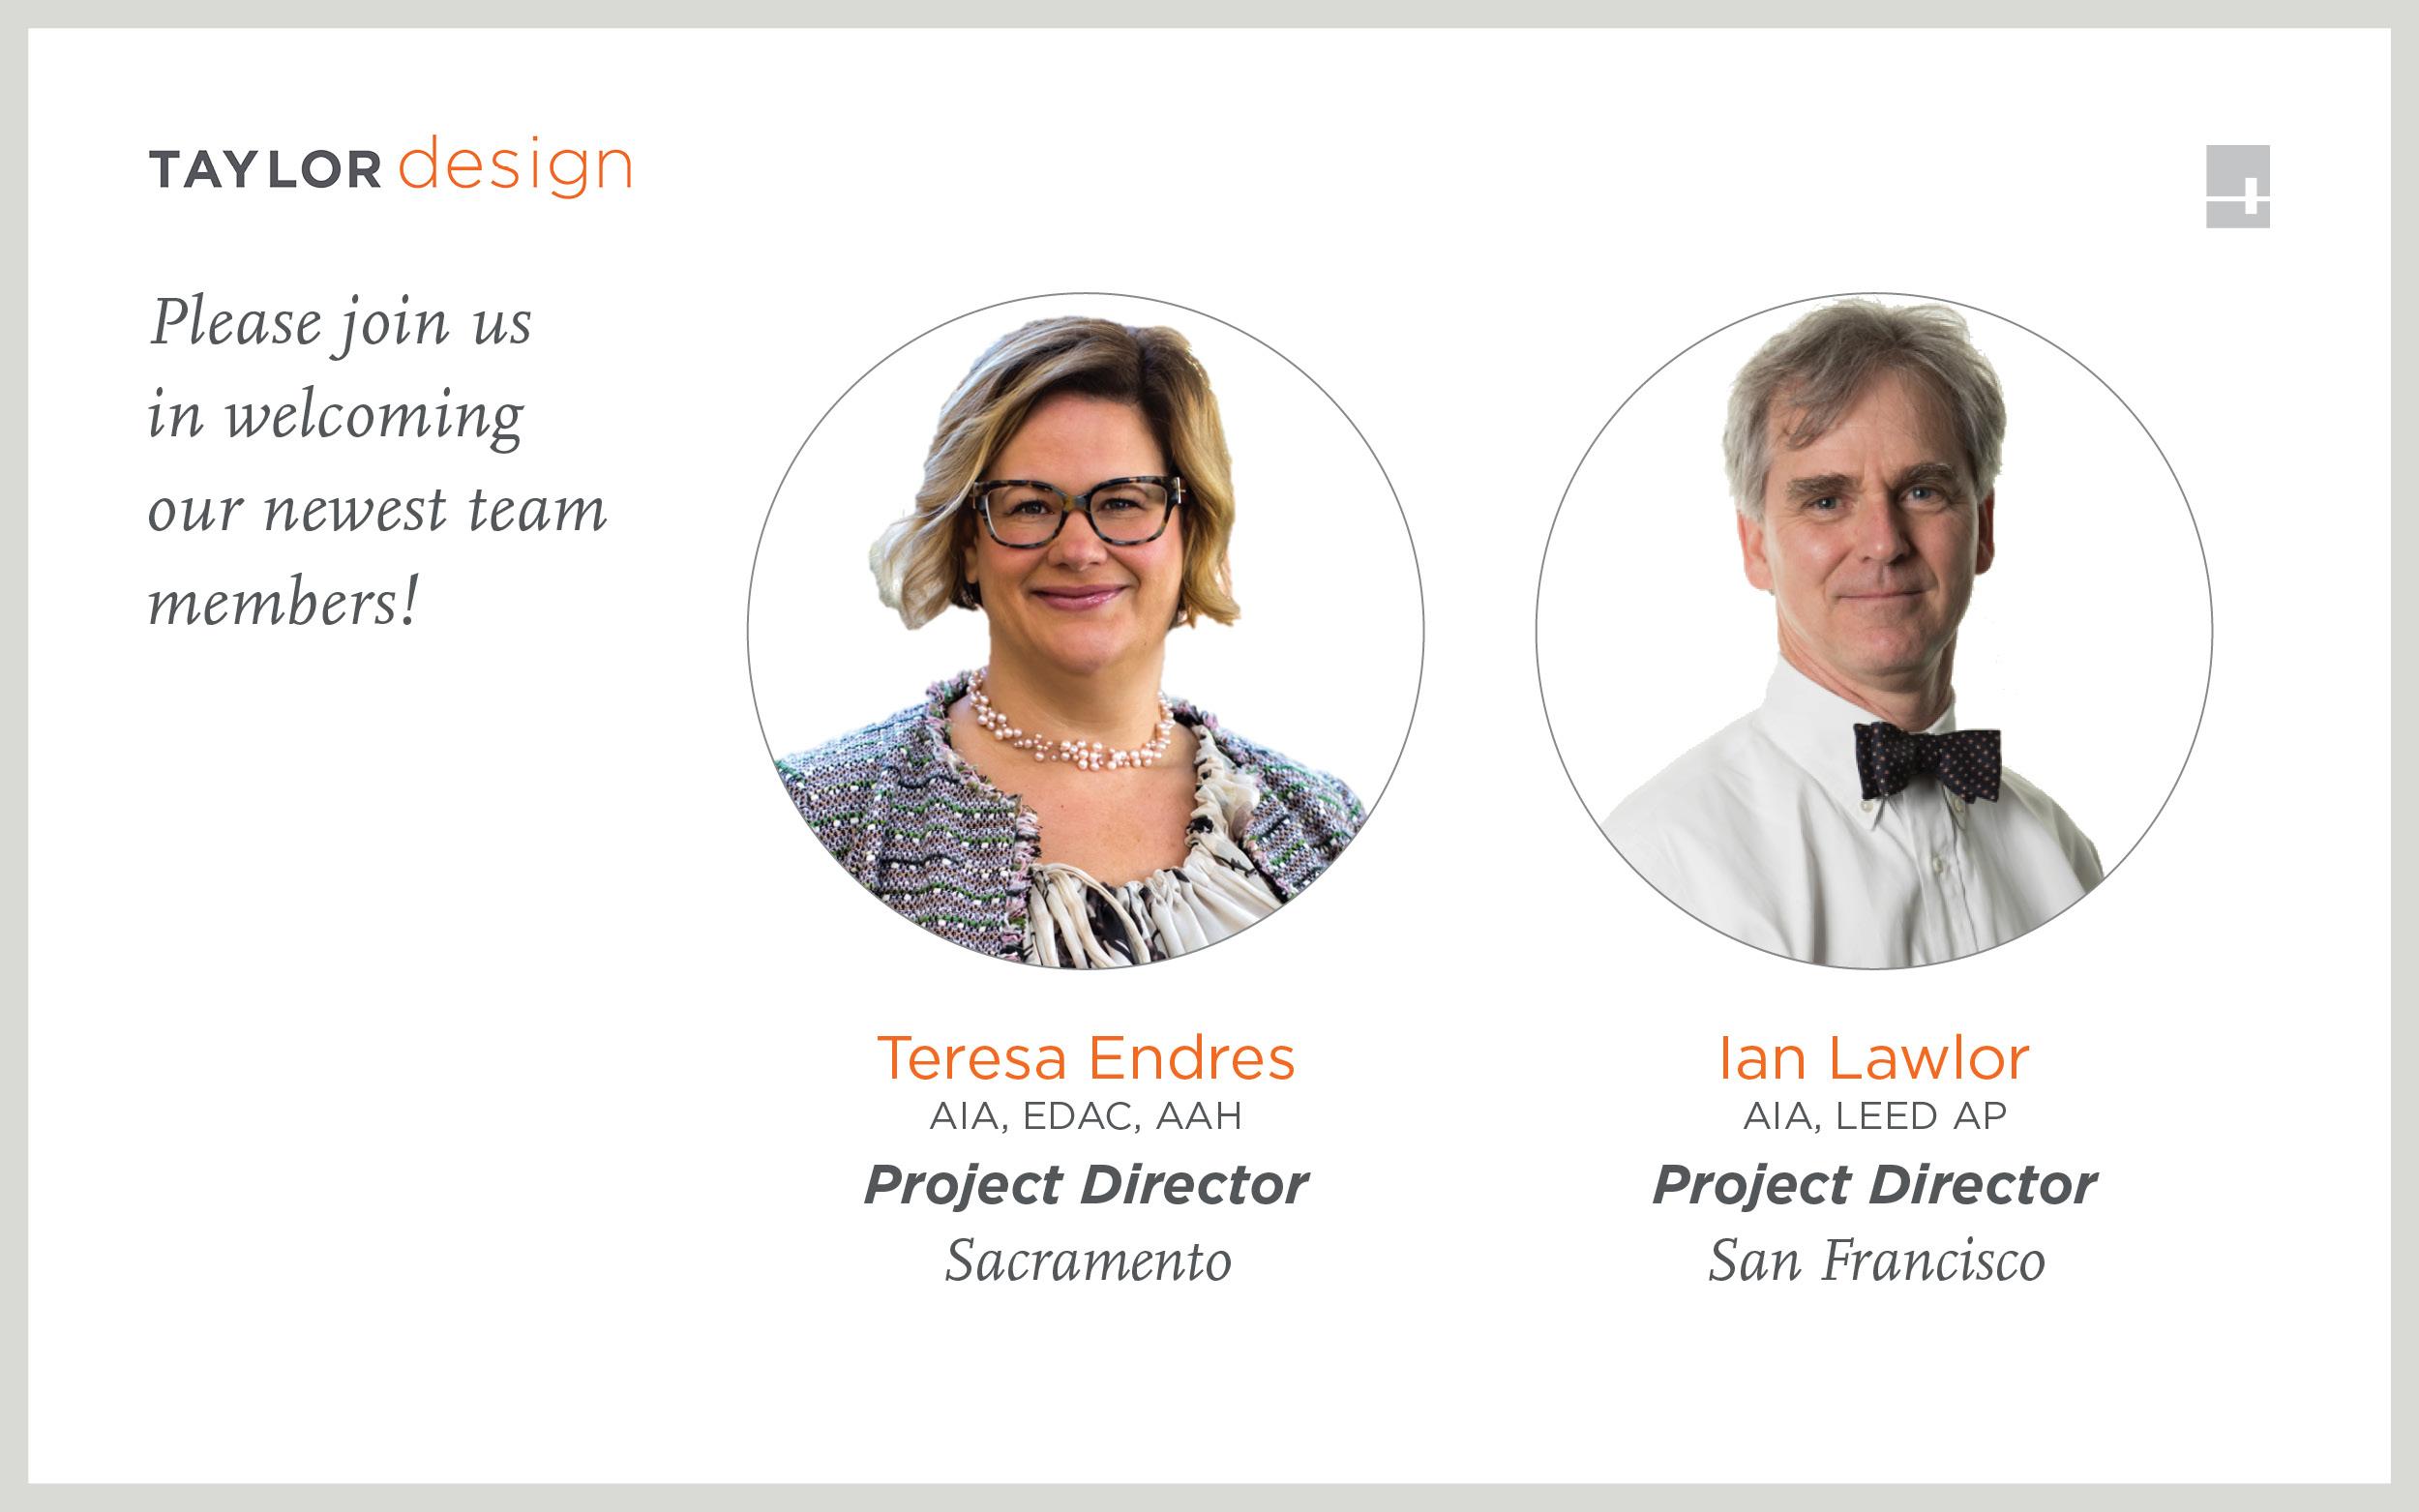 Teresa Endres and Ian Lawlor join Taylor Design